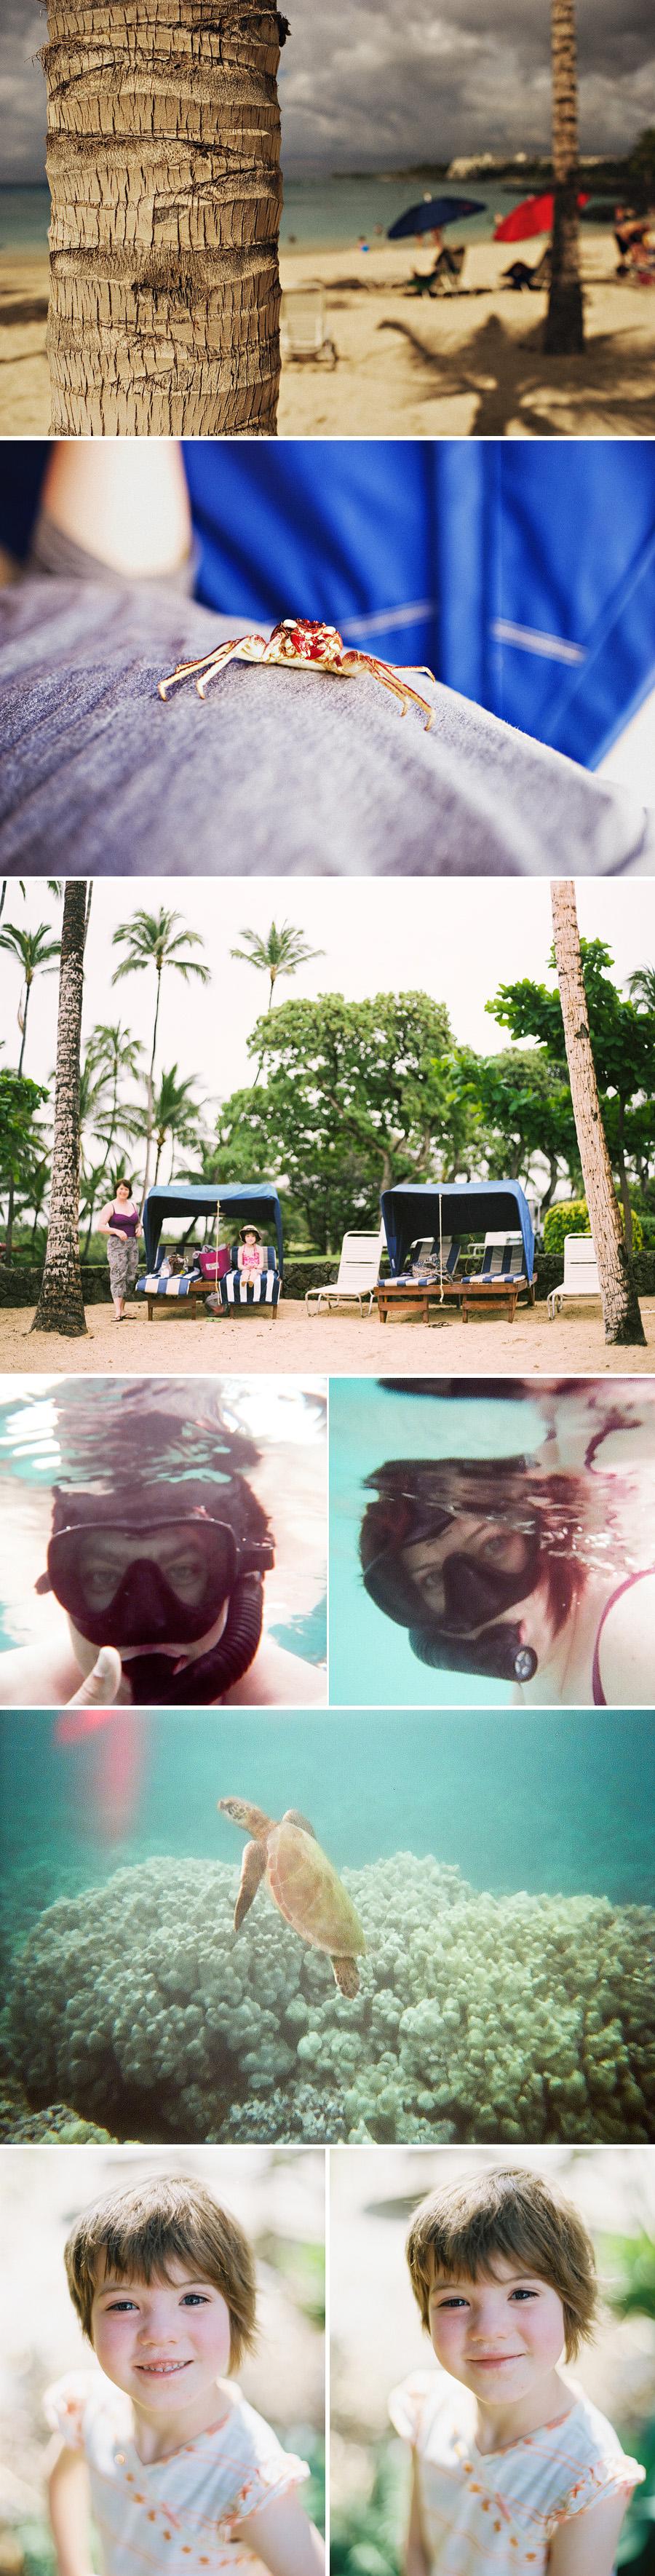 Hawaiian travel photography of beach scenes at the Mauna Lani Beach Club and Mauna Lani Bay.